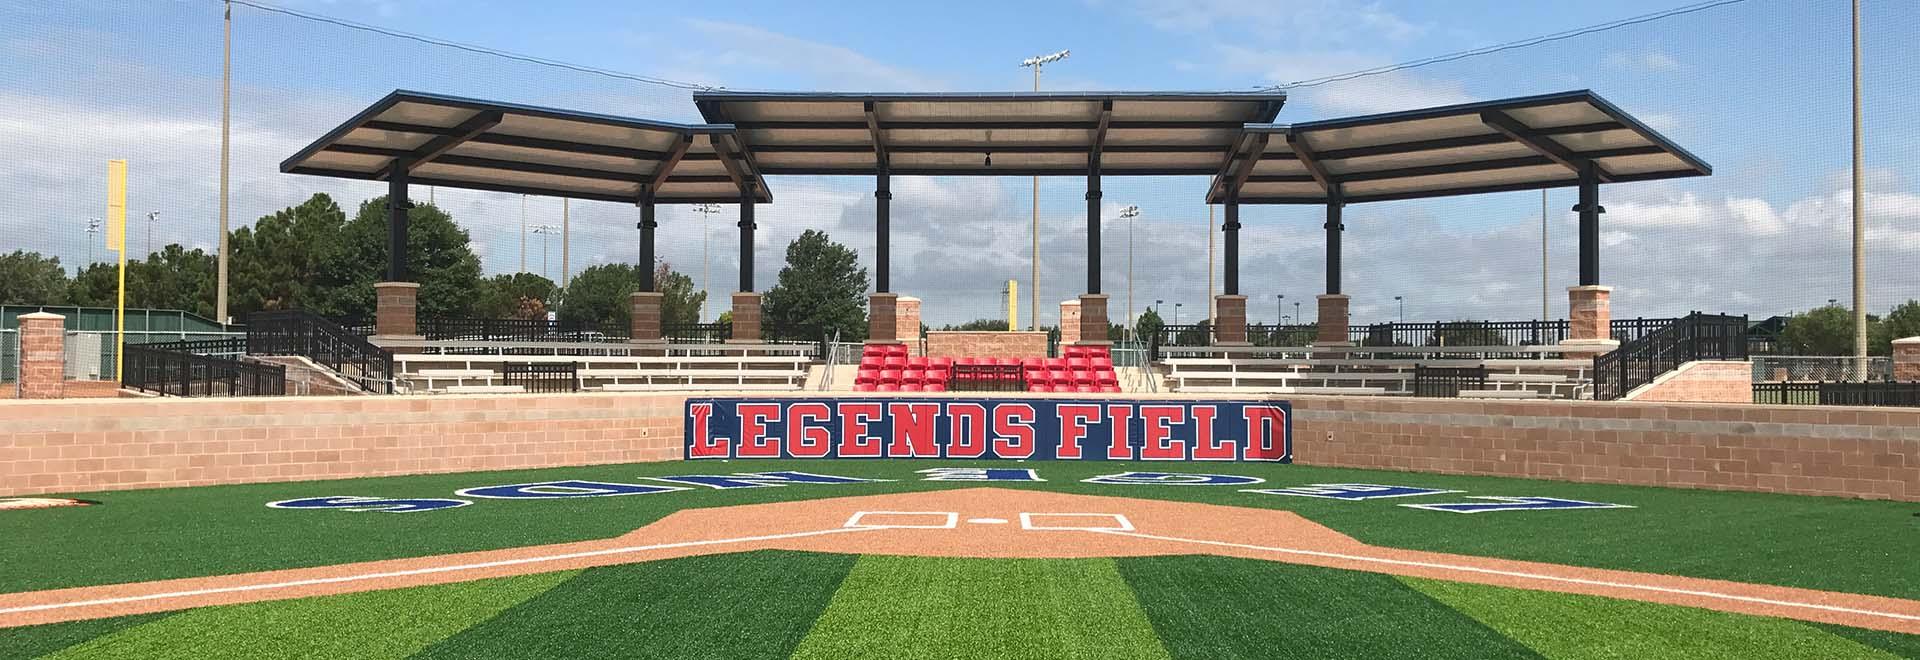 [Legends Field]